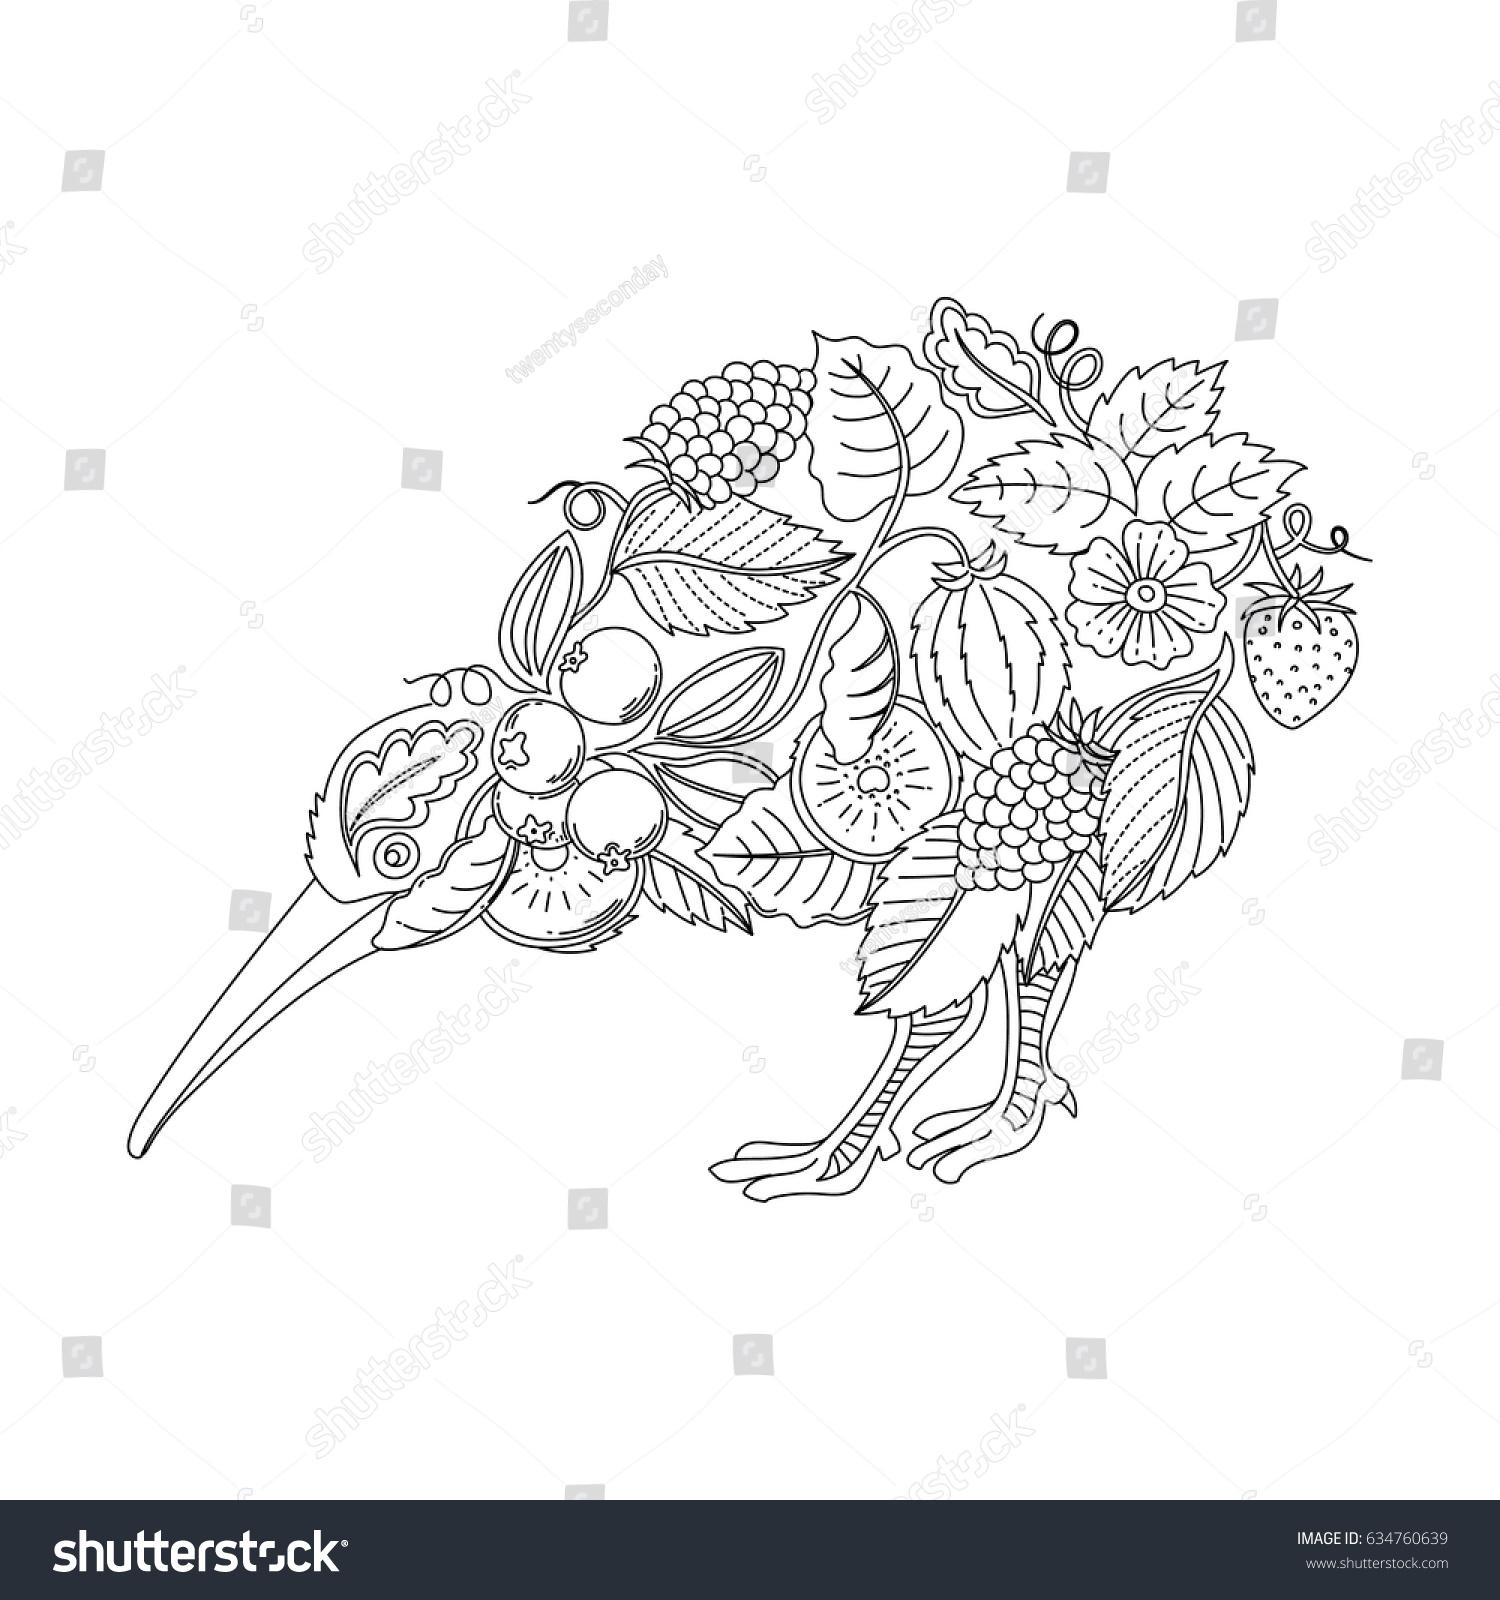 Adult Coloring Kiwi Bird Stock Vector Royalty Free 634760639